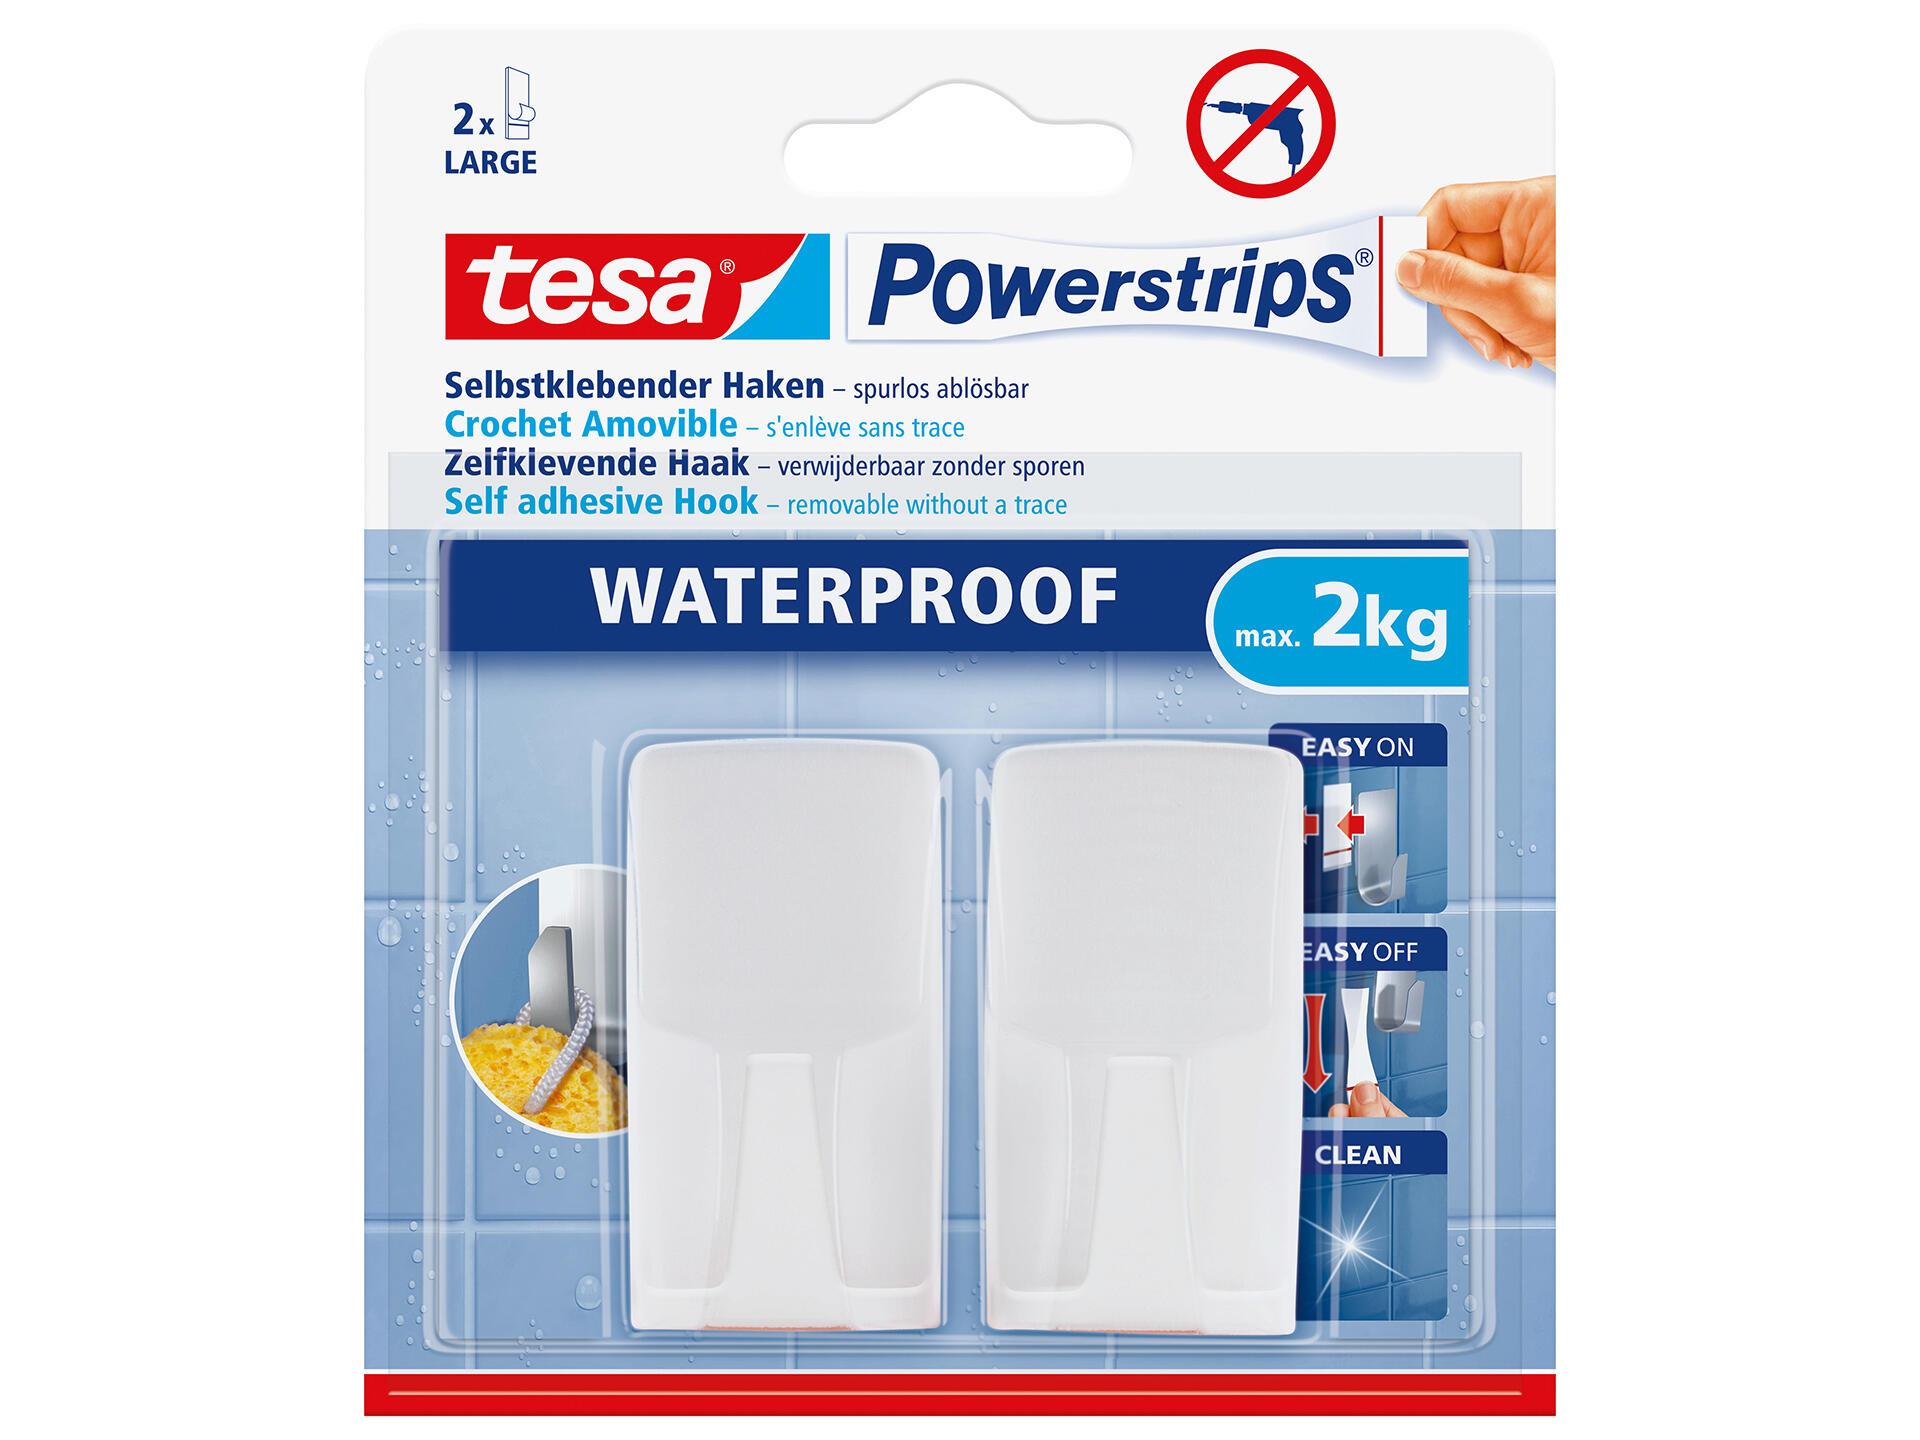 Tesa Powerstrips Haak Wit 14cm 2kg 2 Stuks Hubo